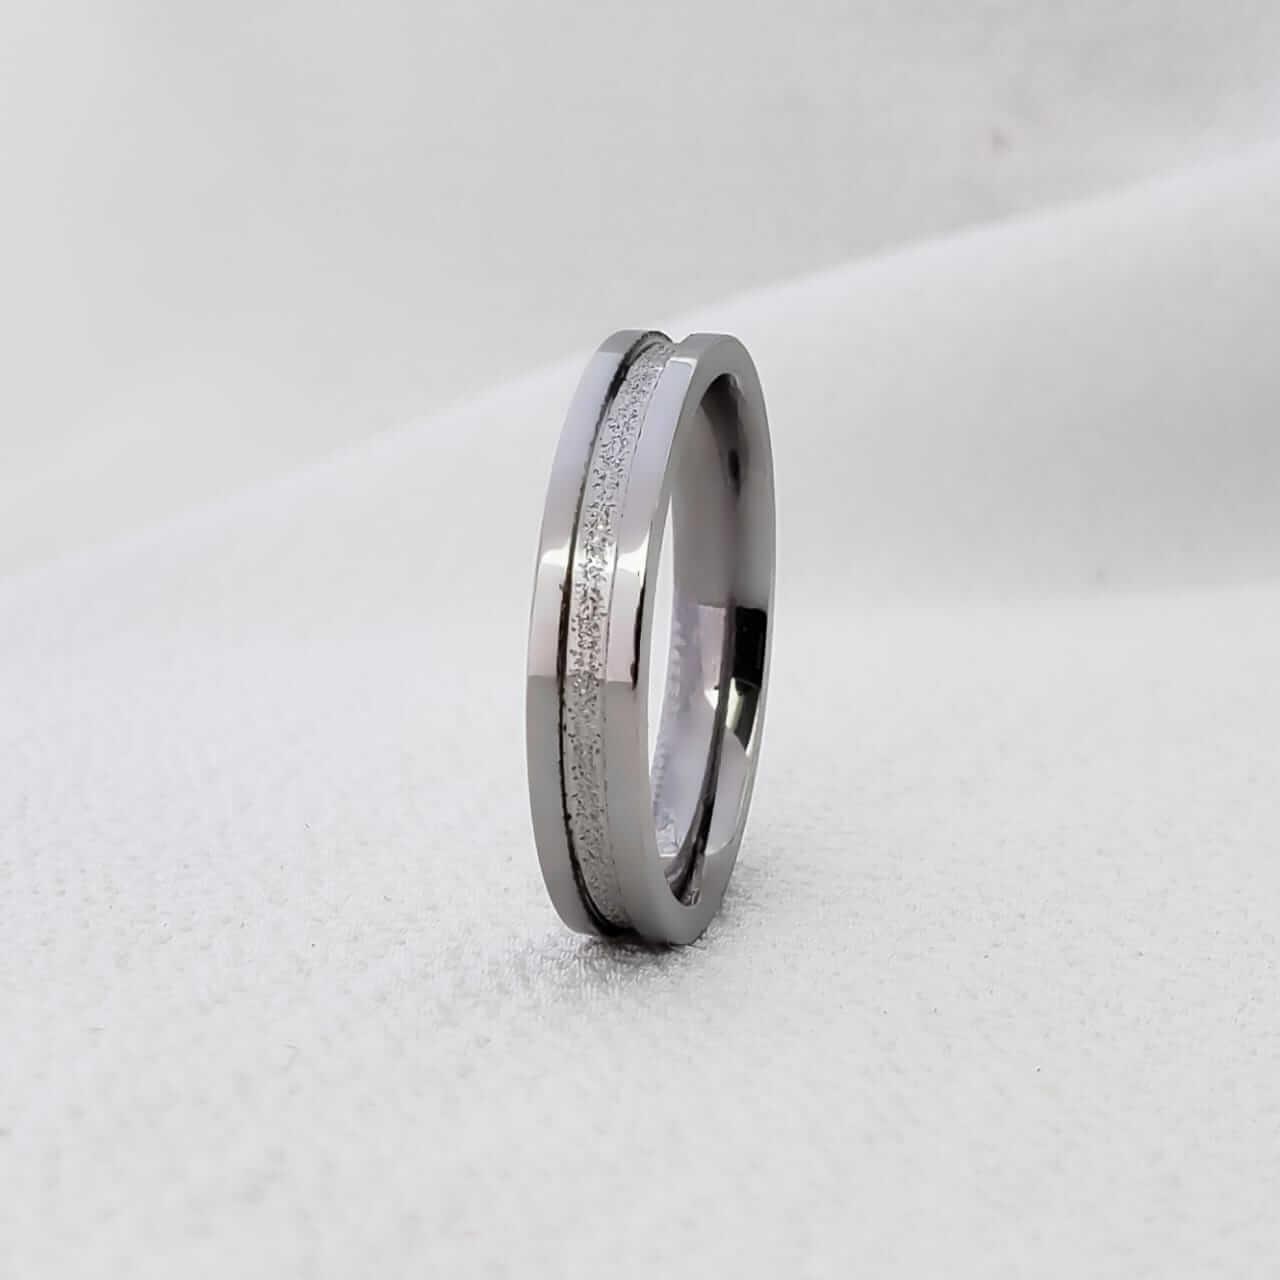 Alianças Jasmine 240 em Aço Inox 4mm (Masculina)